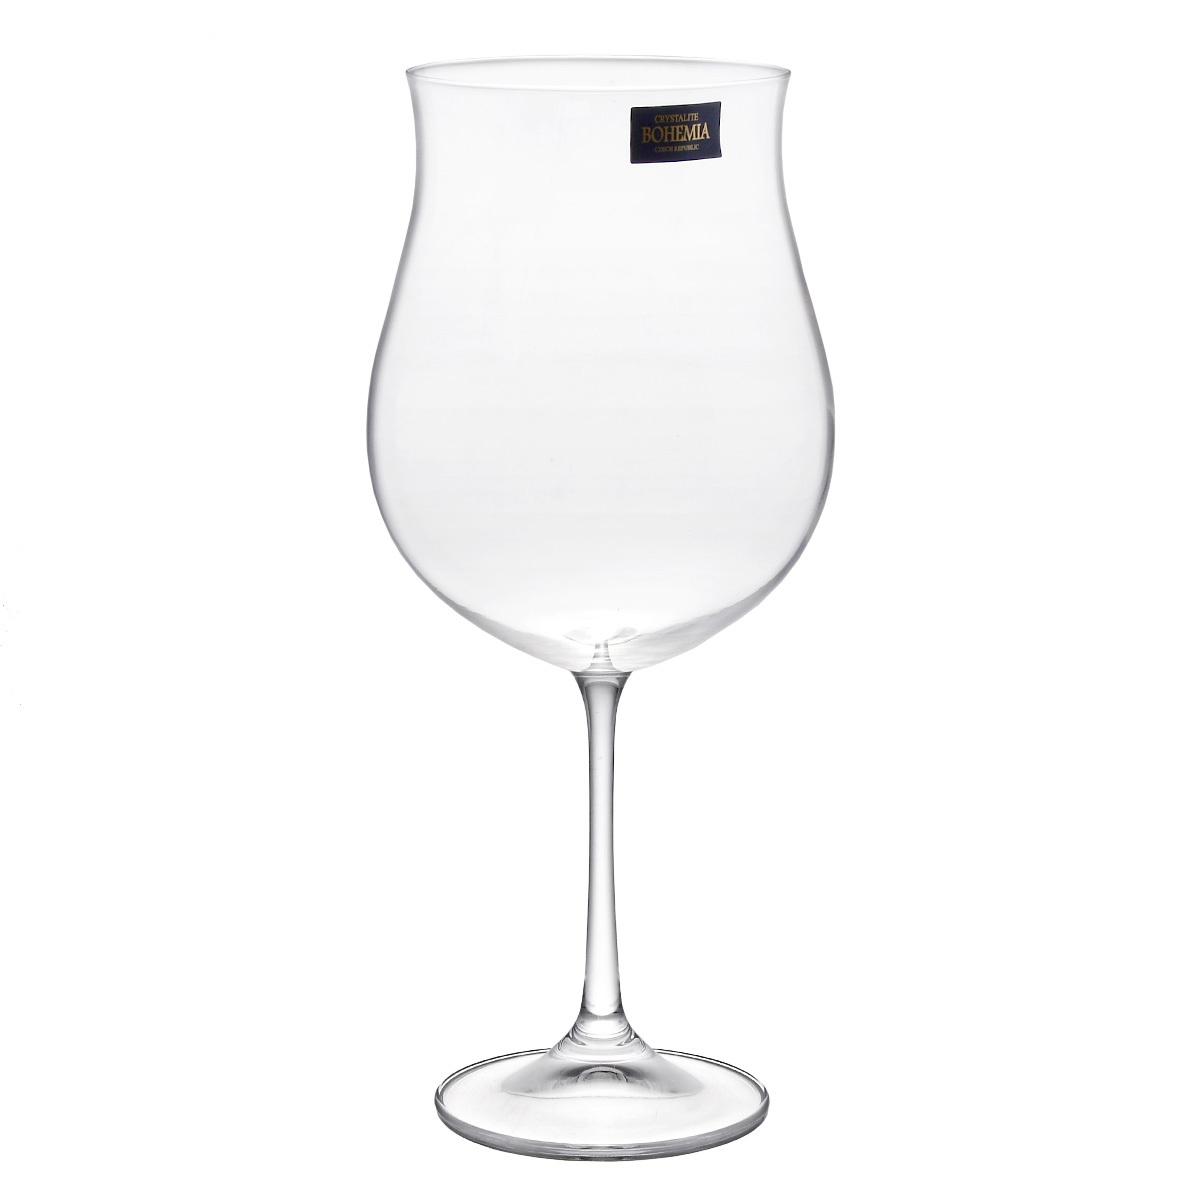 Набор из 6 бокалов для вина Crystalite Bohemia SAFIA, 640 мл набор бокалов для вина 150 мл bohemia